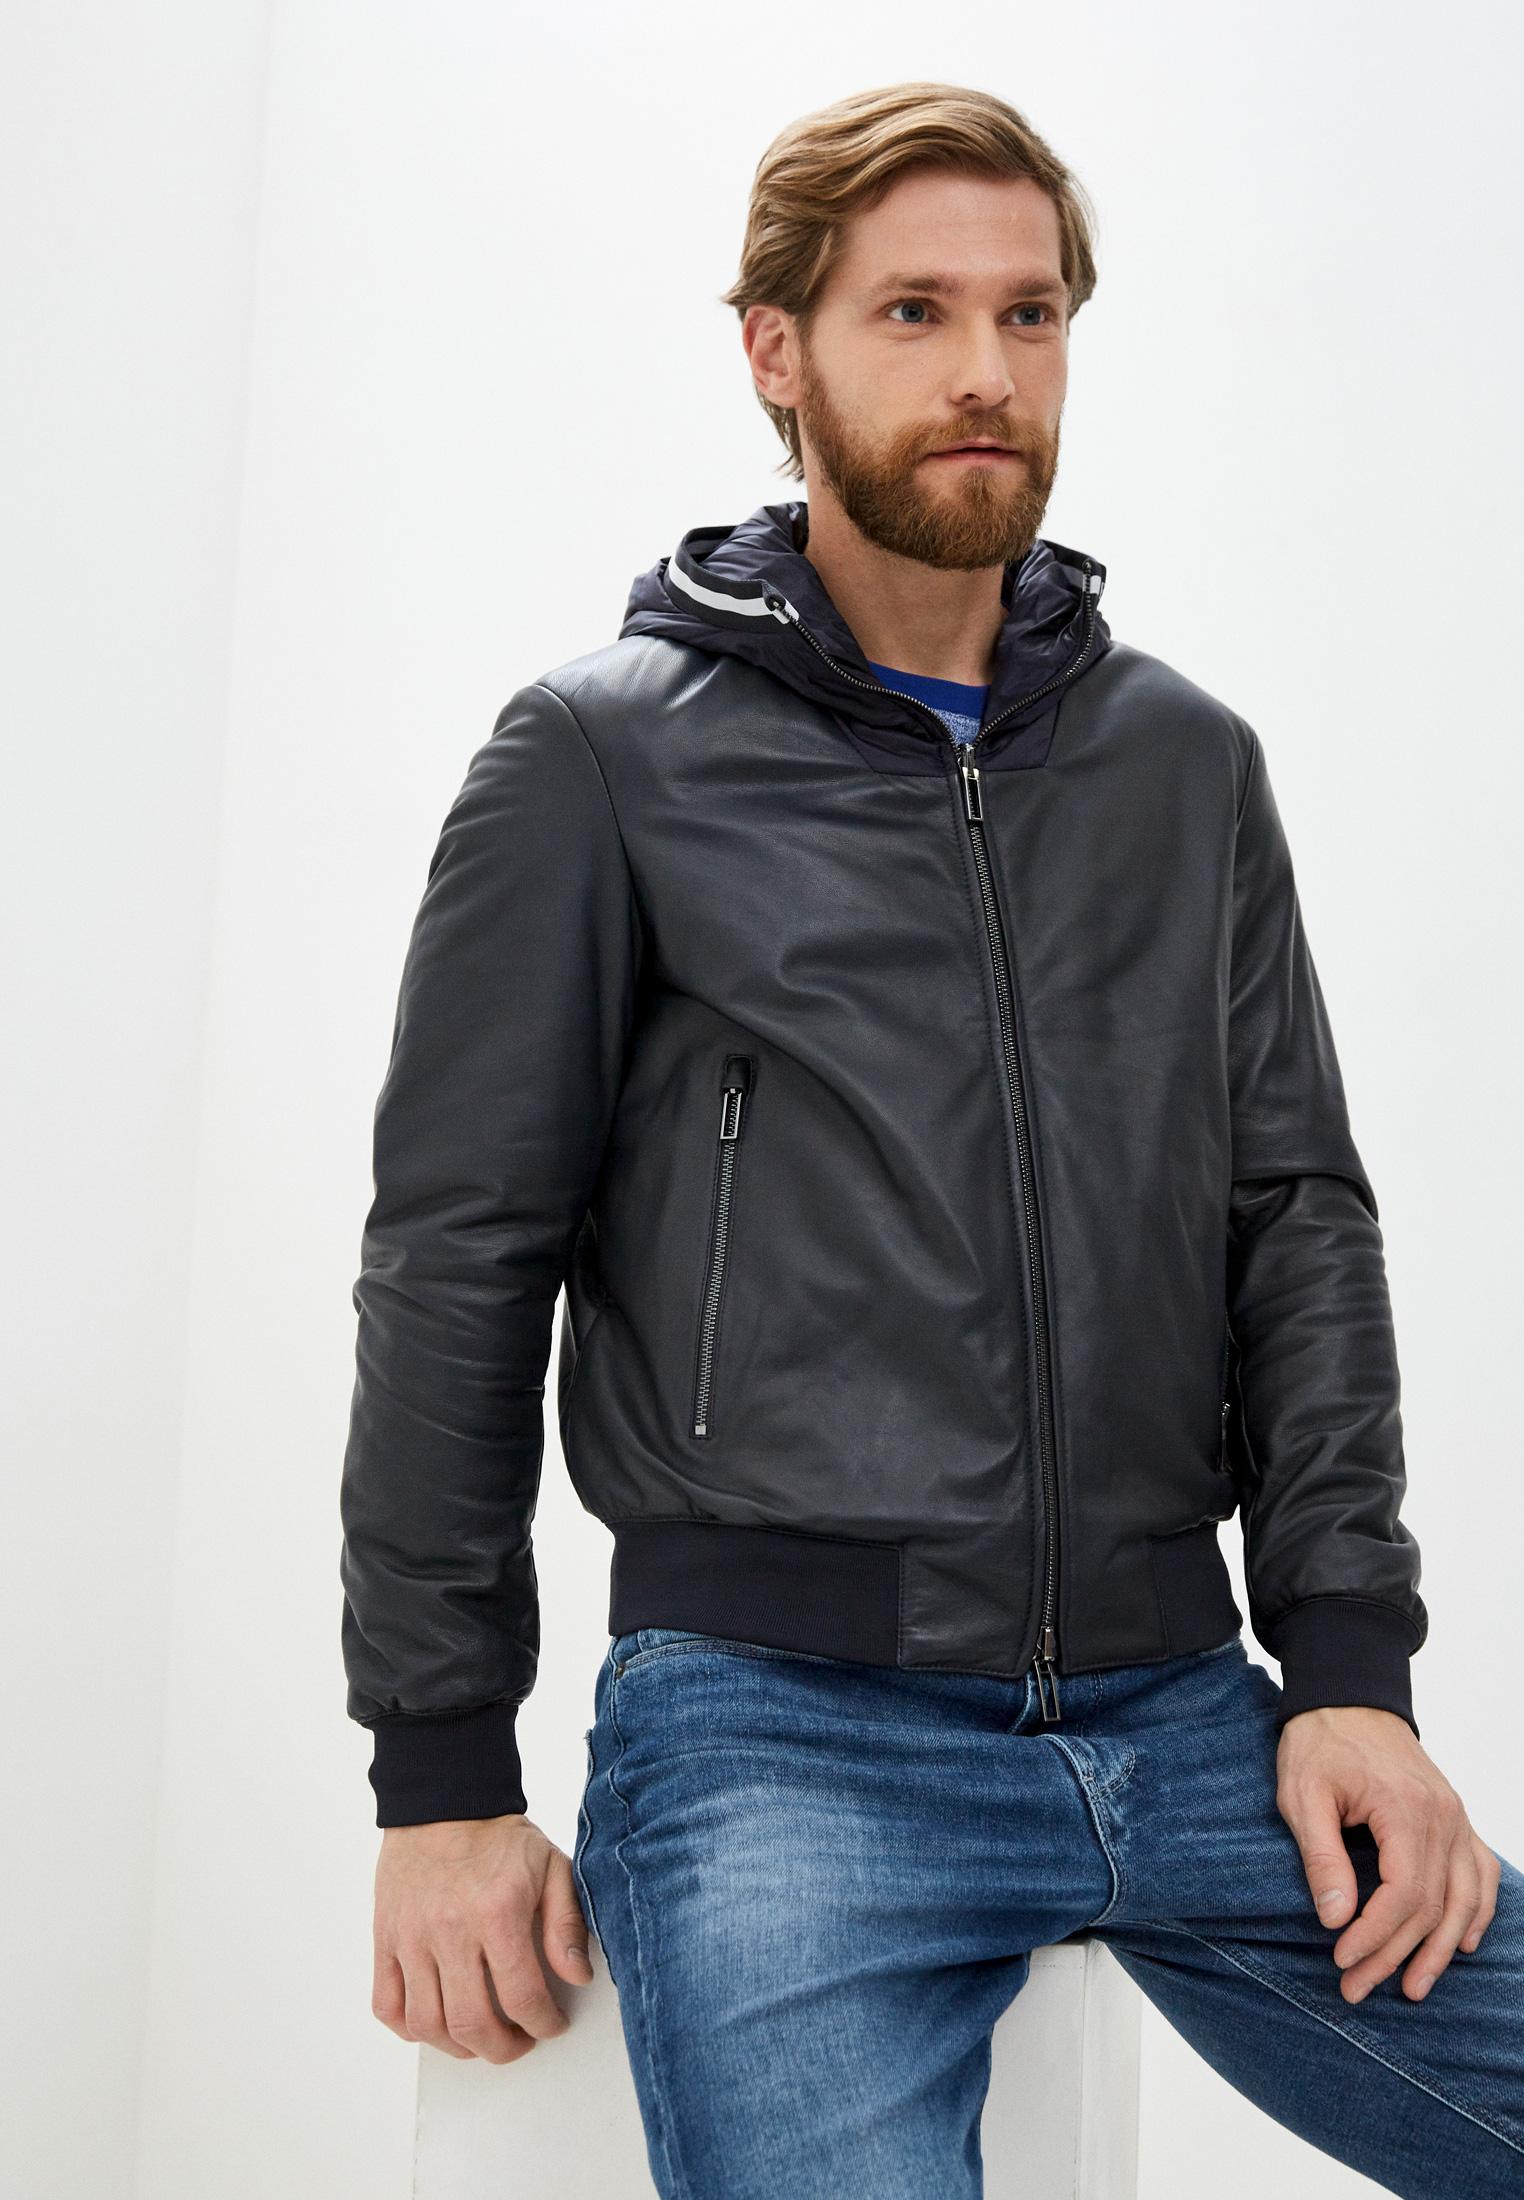 Кожаная куртка Emporio Armani (Эмпорио Армани) 91b68p 91p68